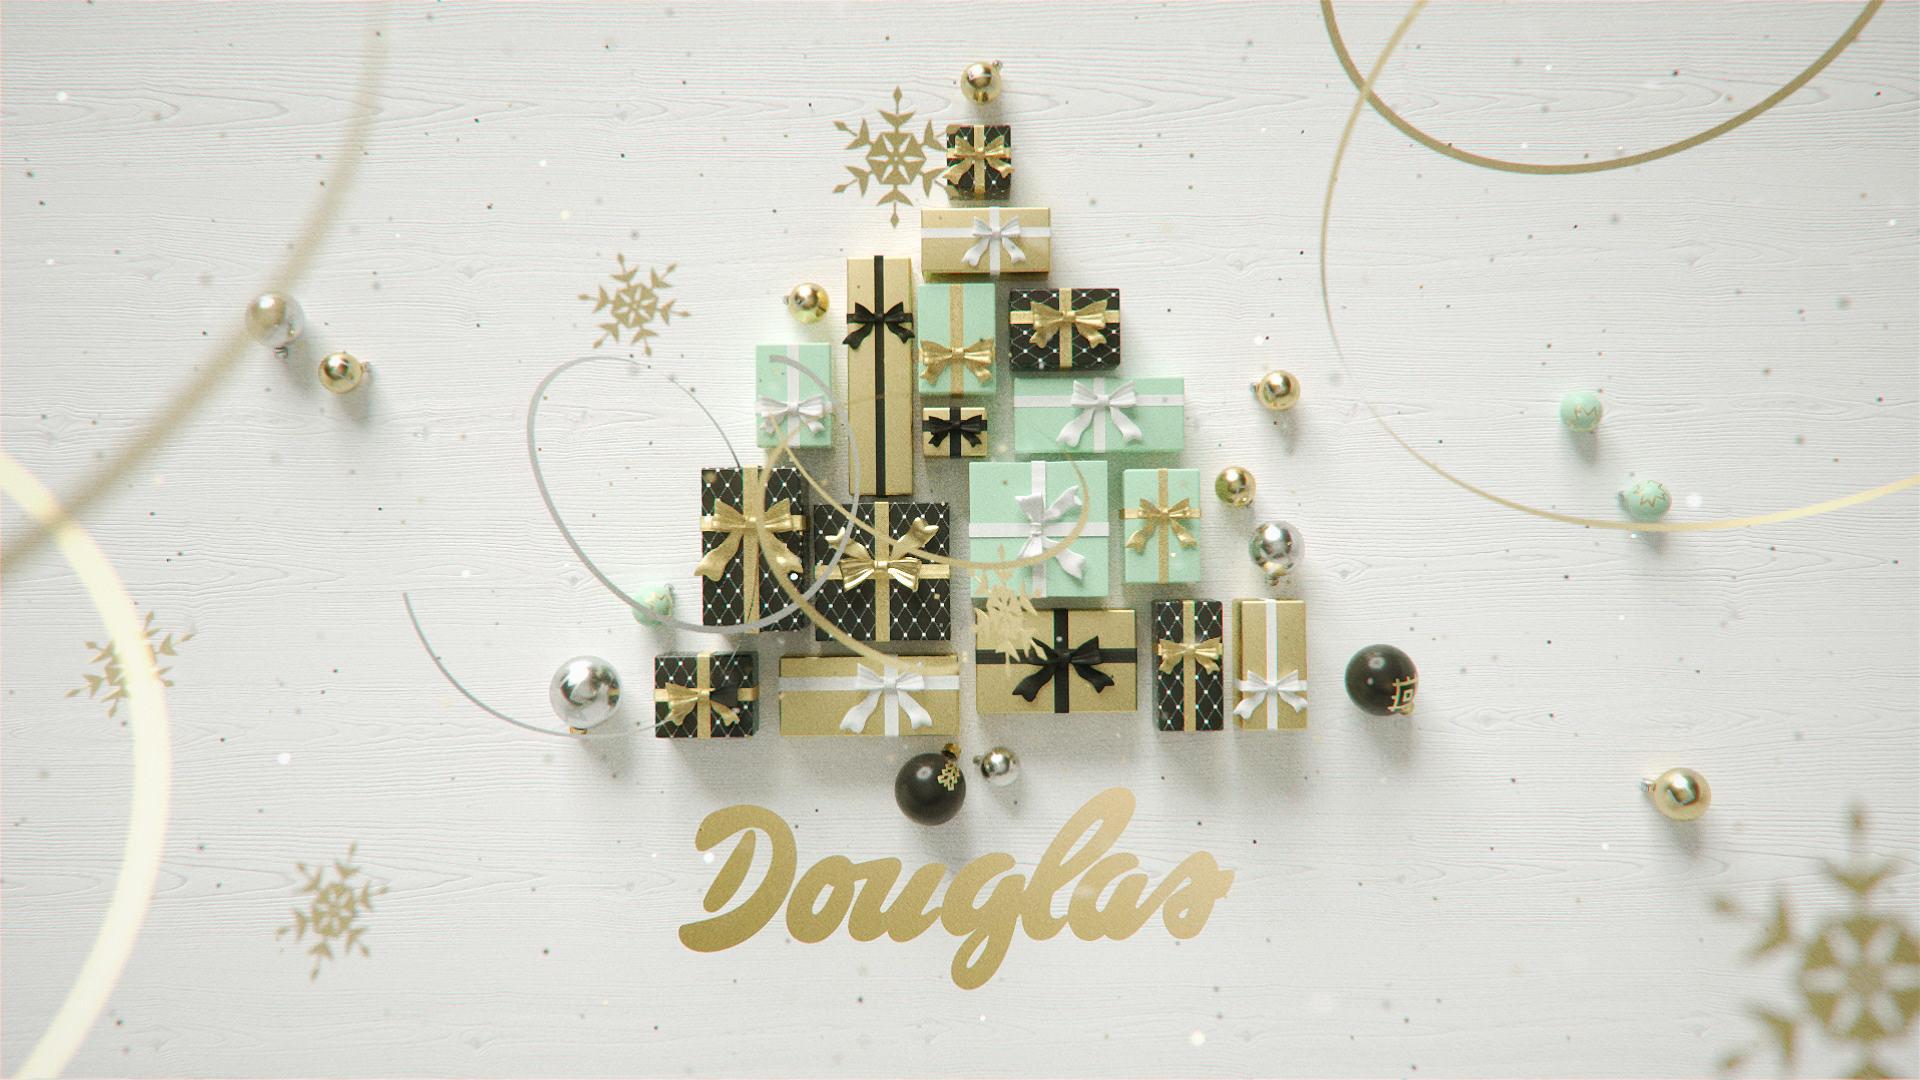 Douglas_christmas_4.jpg